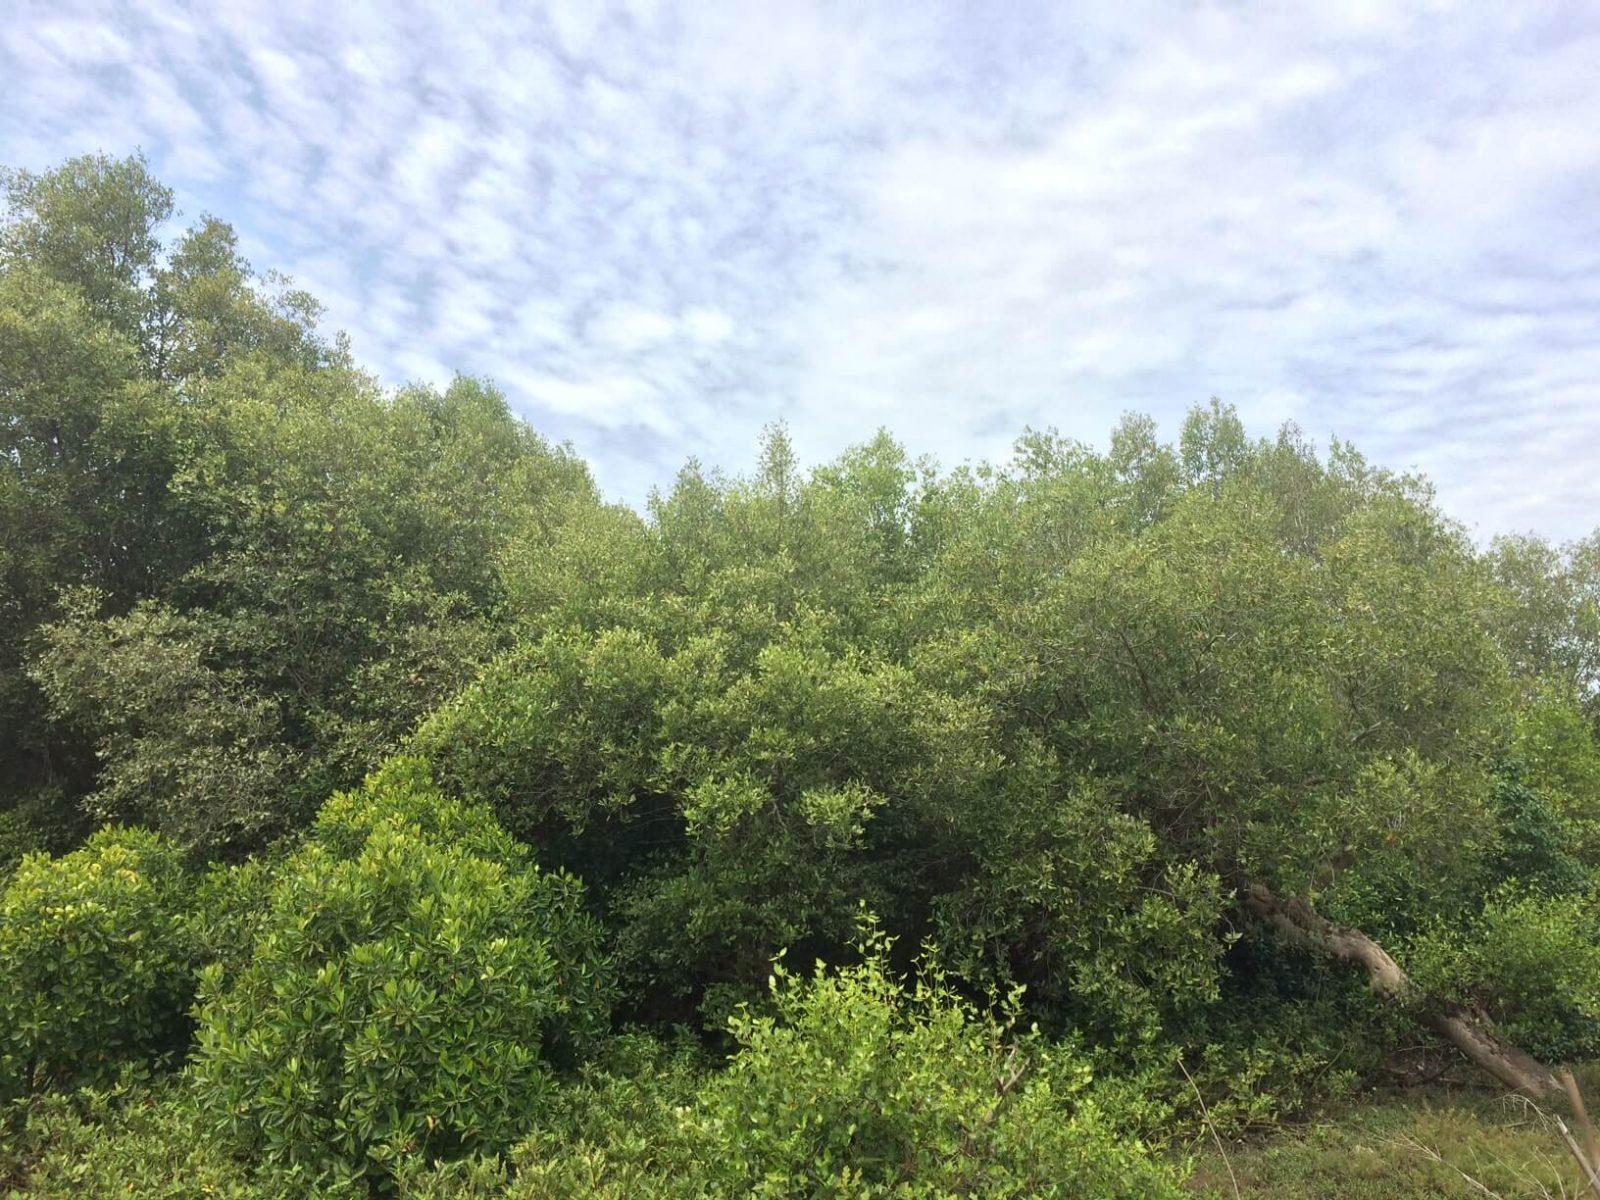 Open Share Cost Trip Ke Kawasan Cagar Alam Pulau Burung Dua Serang Banten